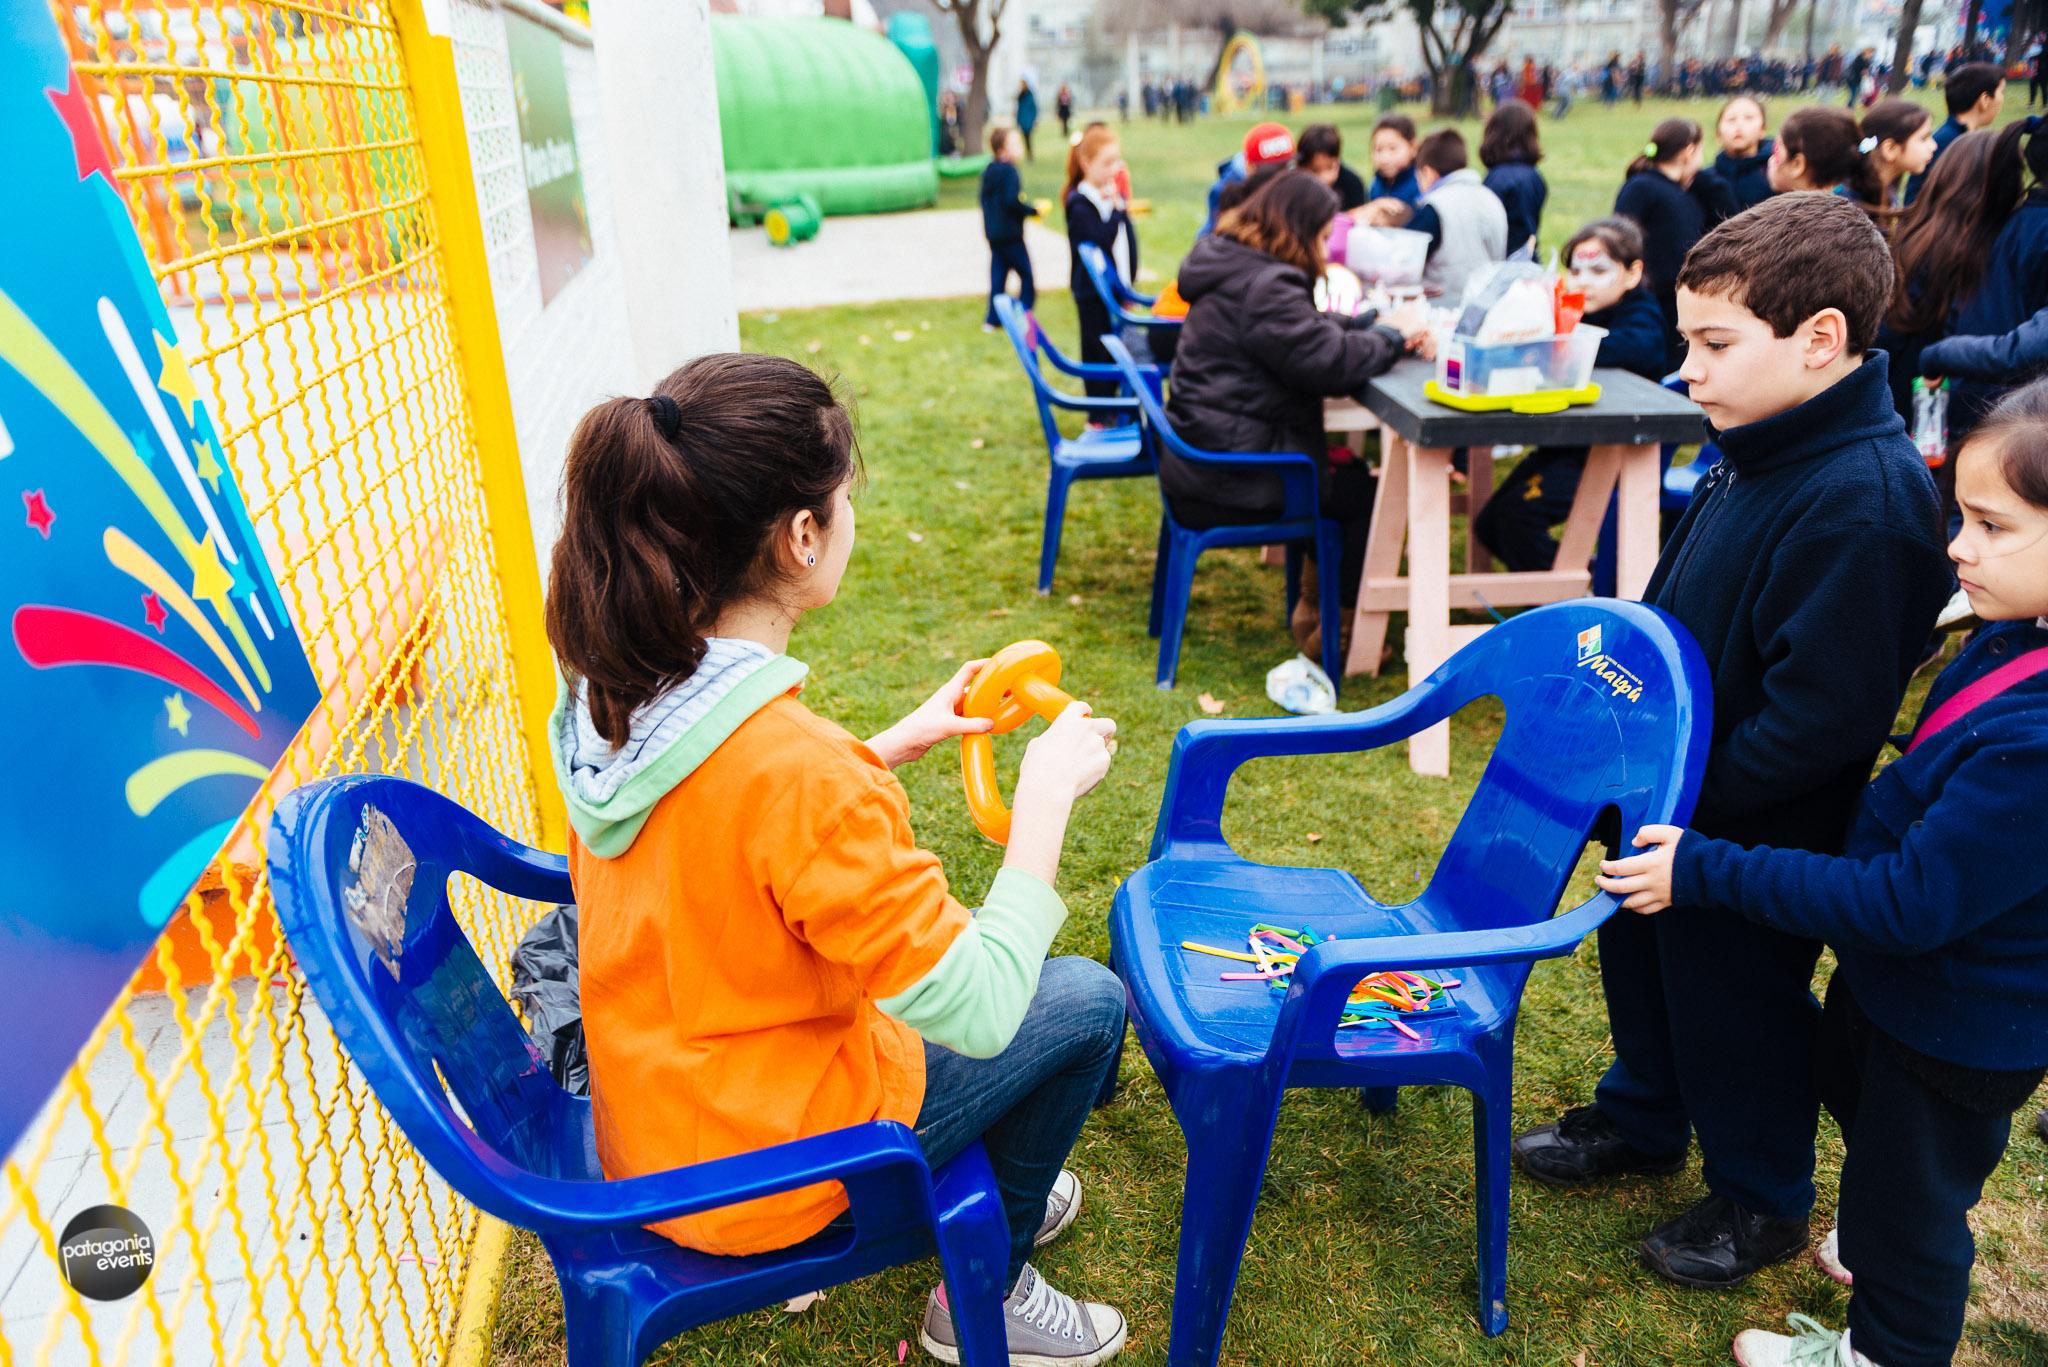 12082016_diadelnino_maipu_patagonia_events_dia_uno_371